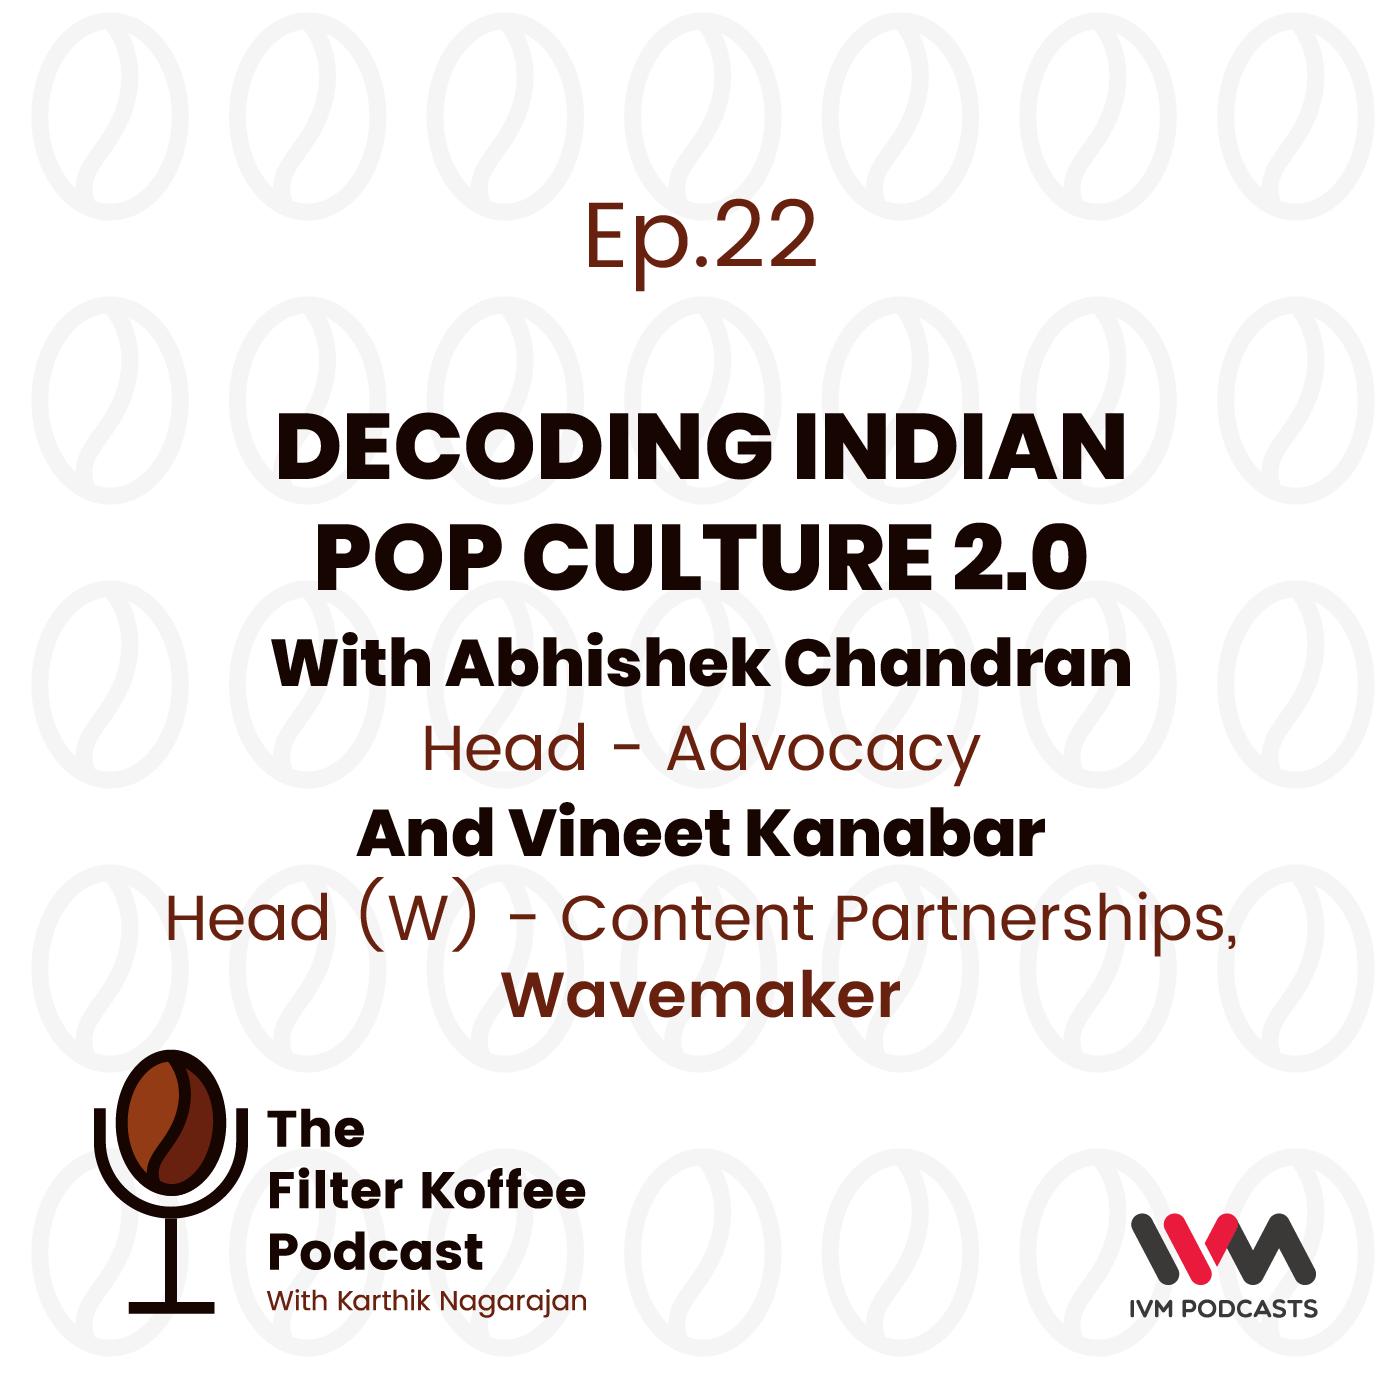 Ep. 22: Decoding Indian Pop Culture 2.0